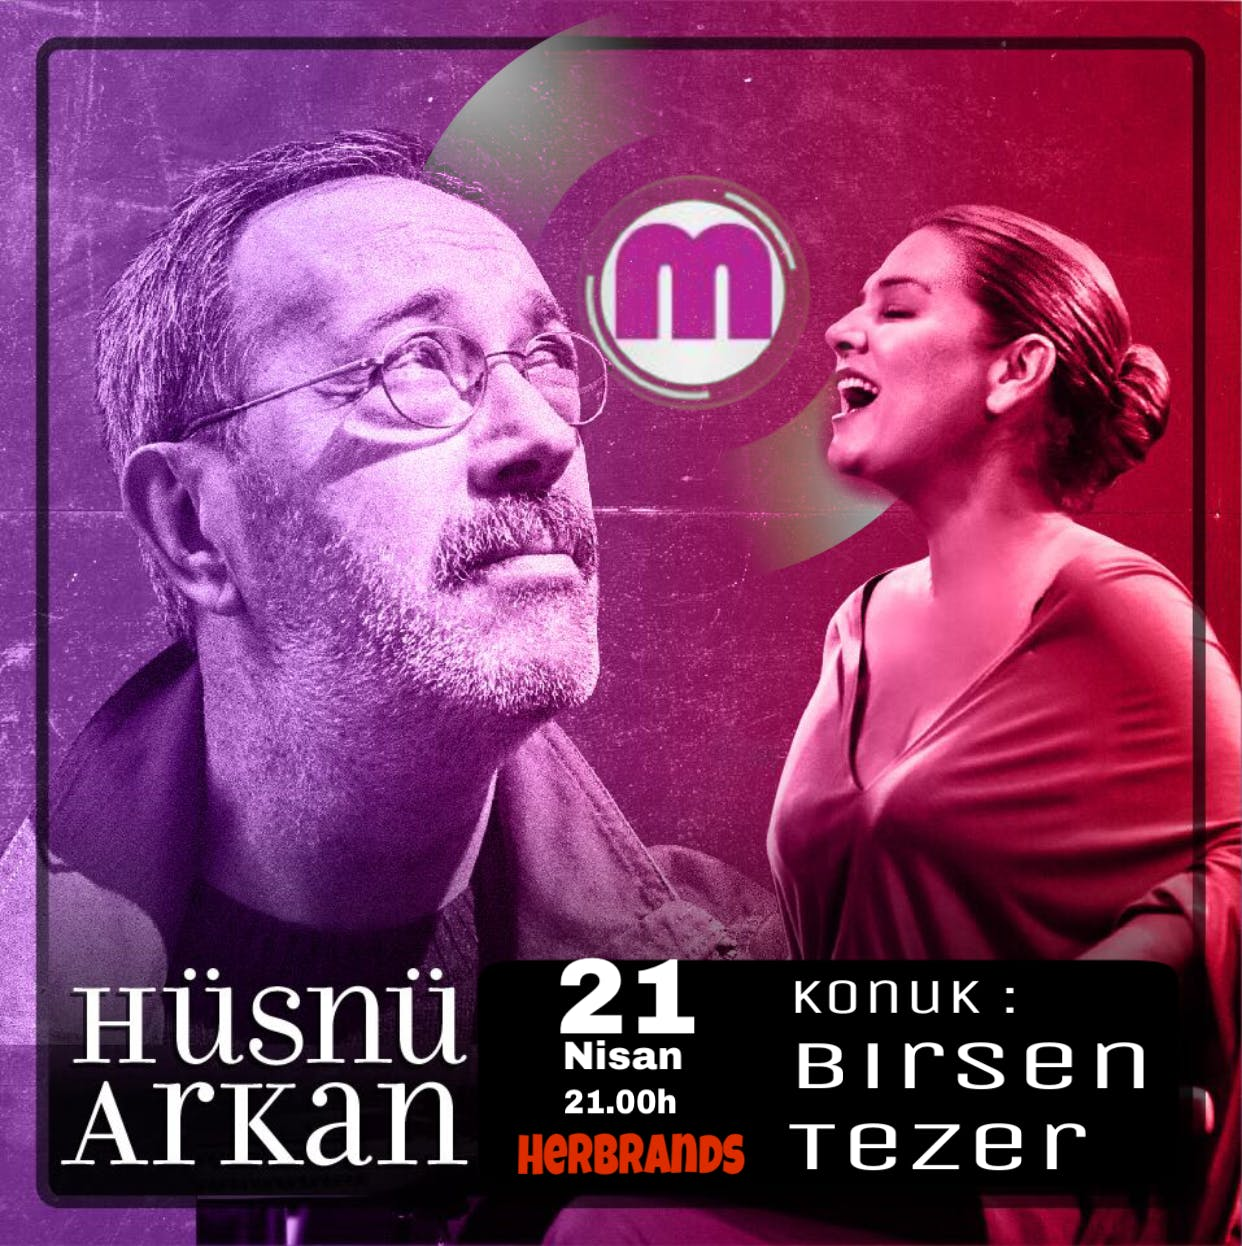 Hsn Arkan und Birsen Tezer Live in KLN